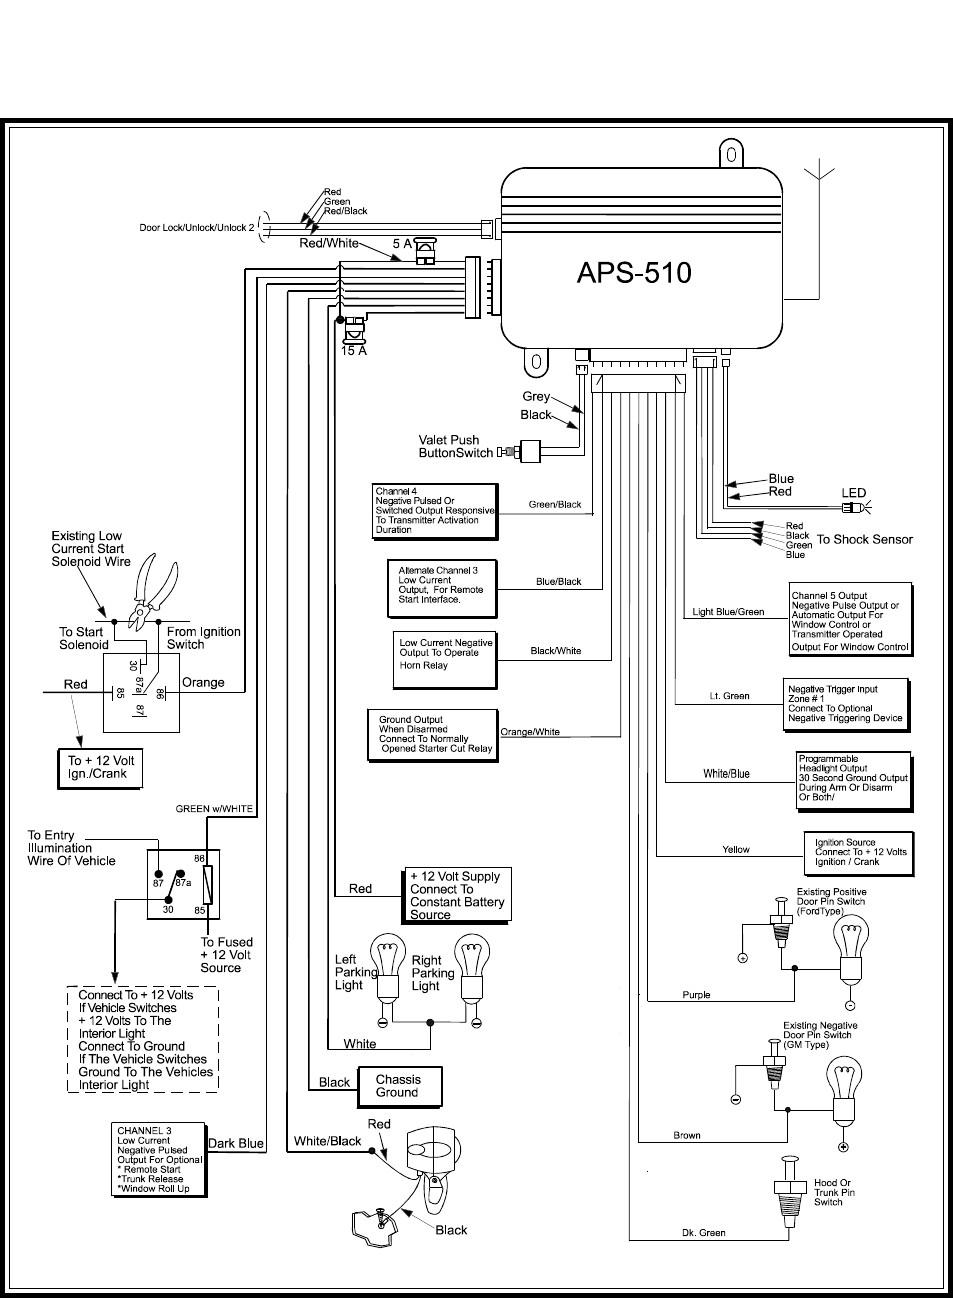 DIAGRAM] Wiring Viper Diagram Alarm Car 560vx FULL Version HD Quality Car  560vx - ARTEDIAGRAMACAO.EVELYNEGAILLOU.FREvelyne Gaillou